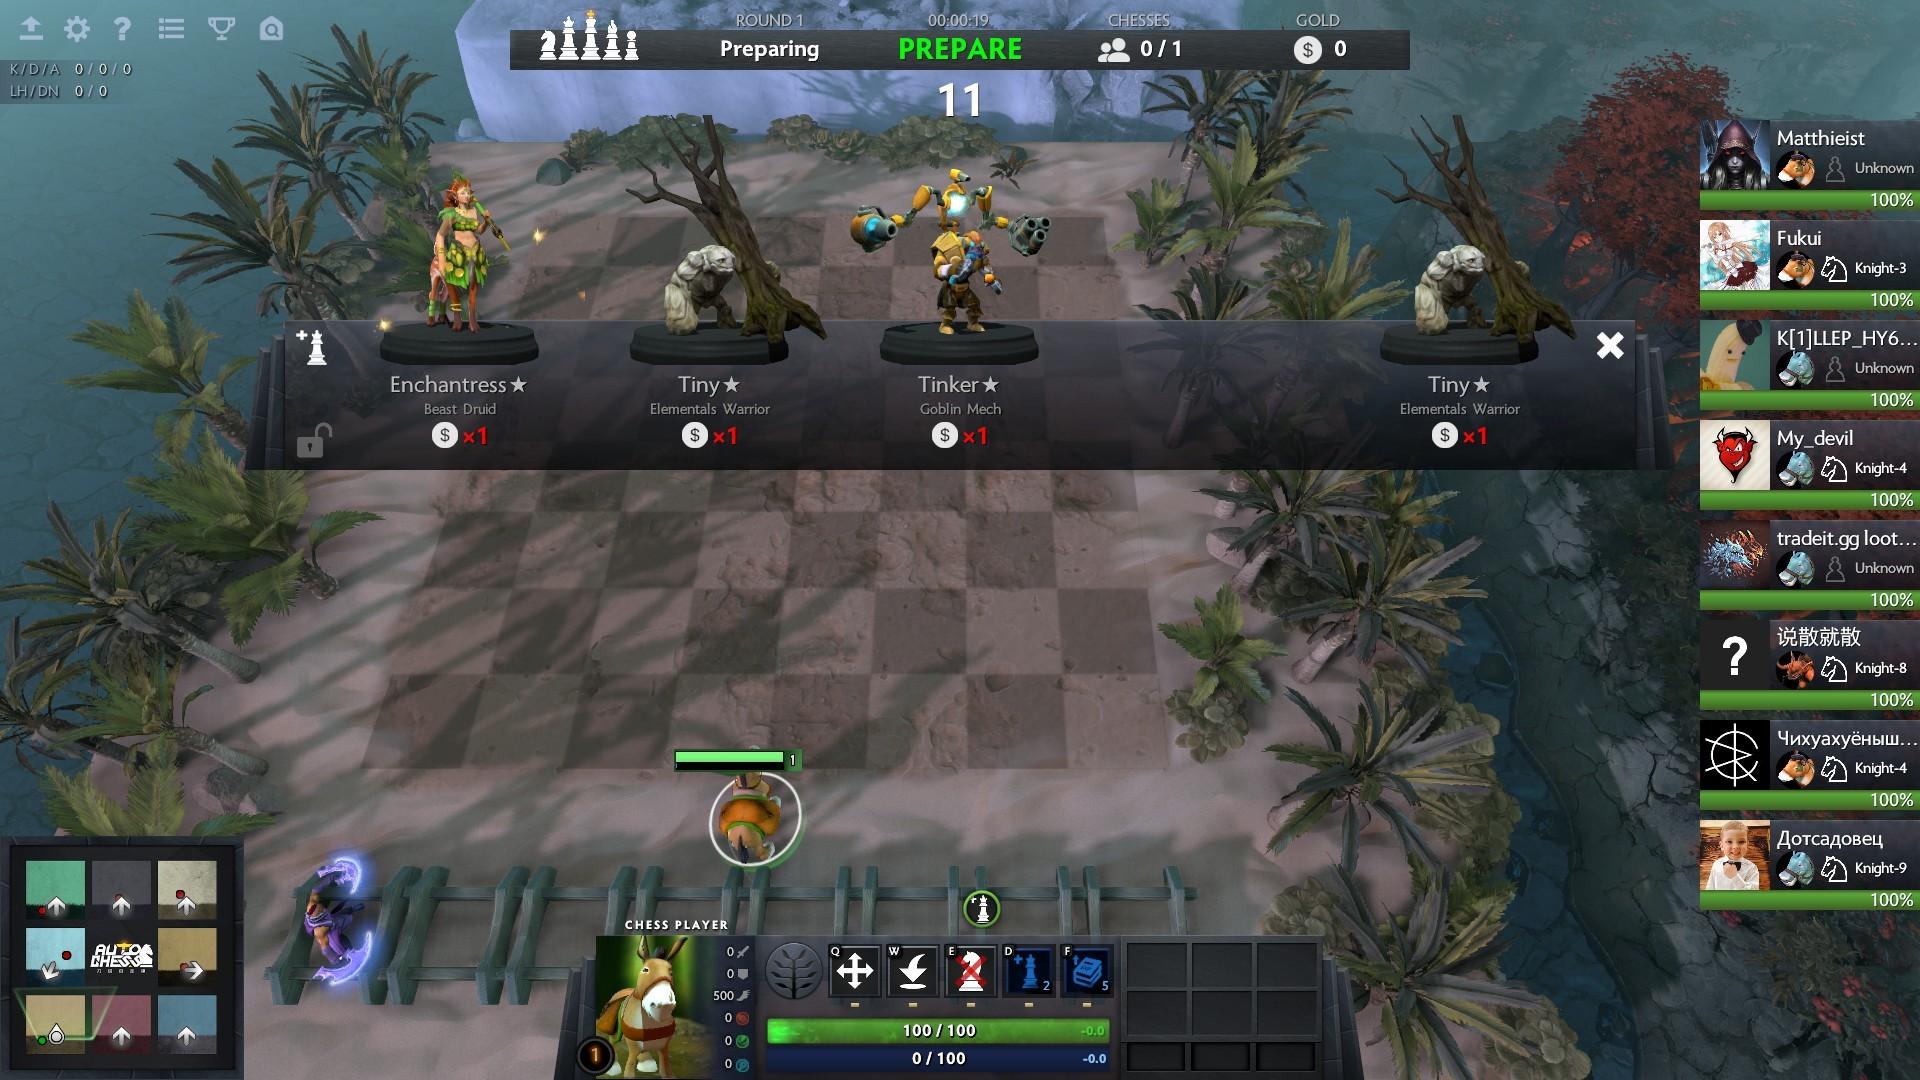 Dota 2: Knights, bishops and    demons? - Exploring Dota Auto Chess